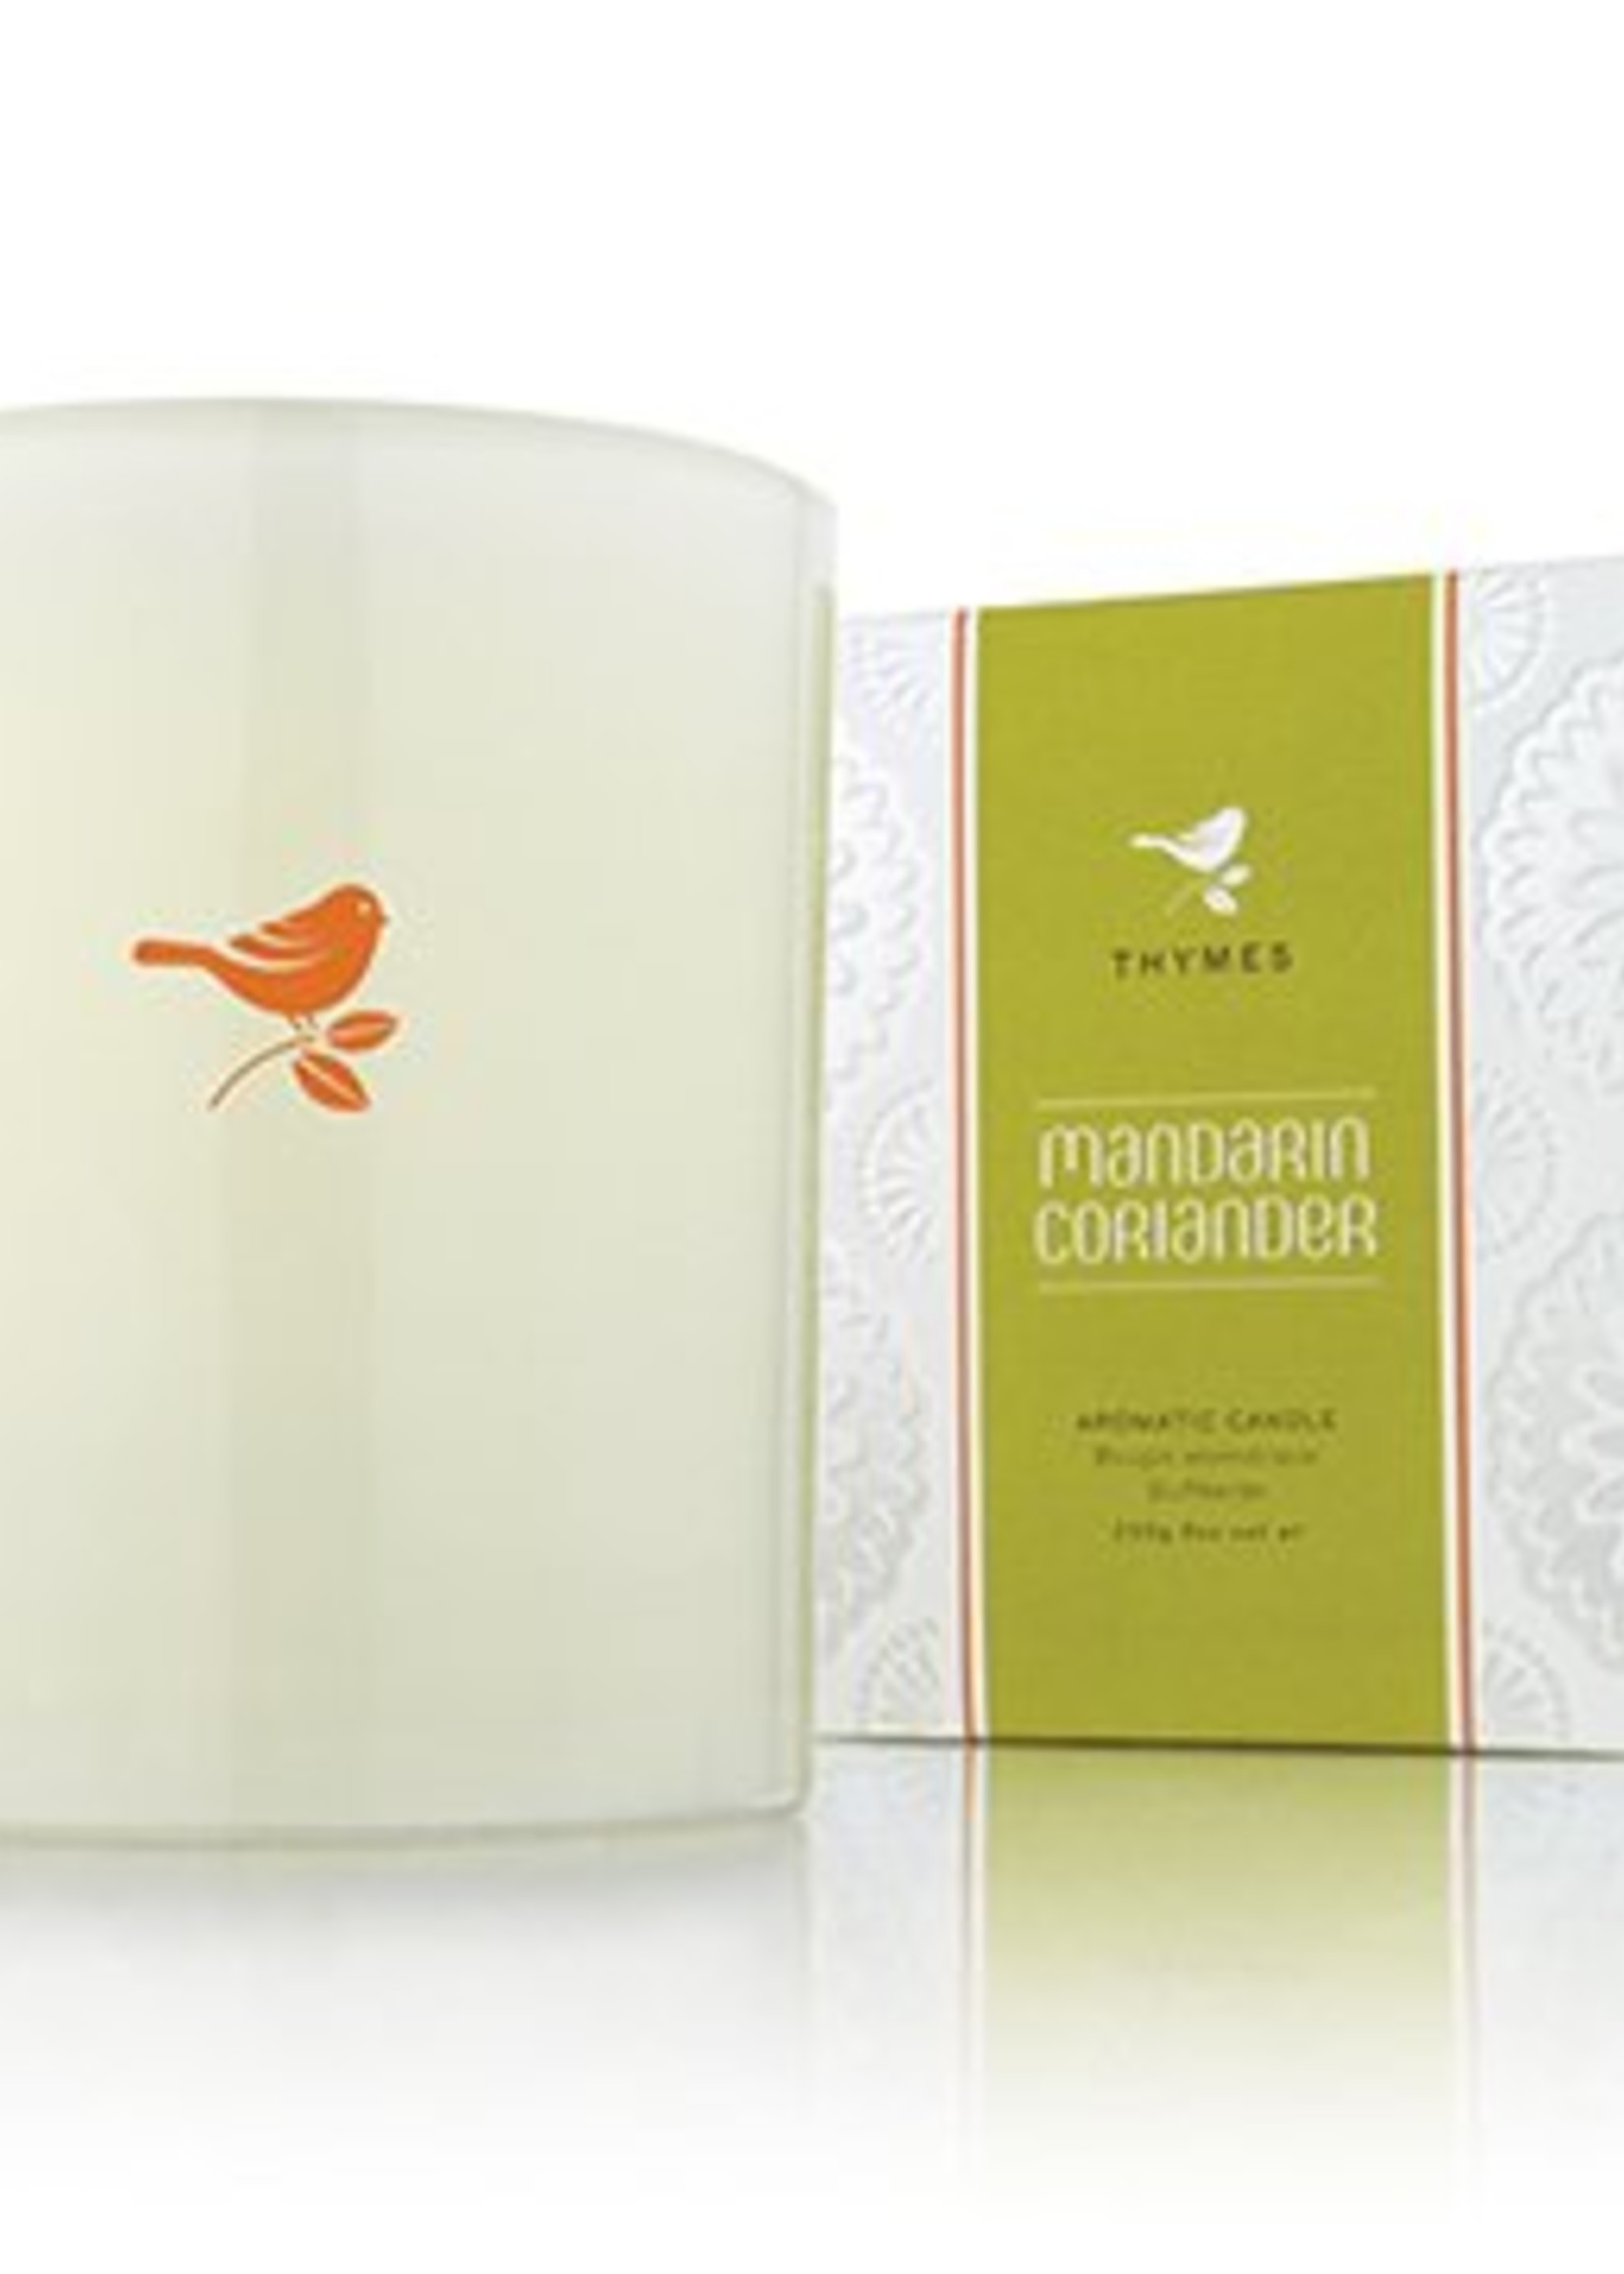 Thymes Mandarin Coriander Candle with Bird